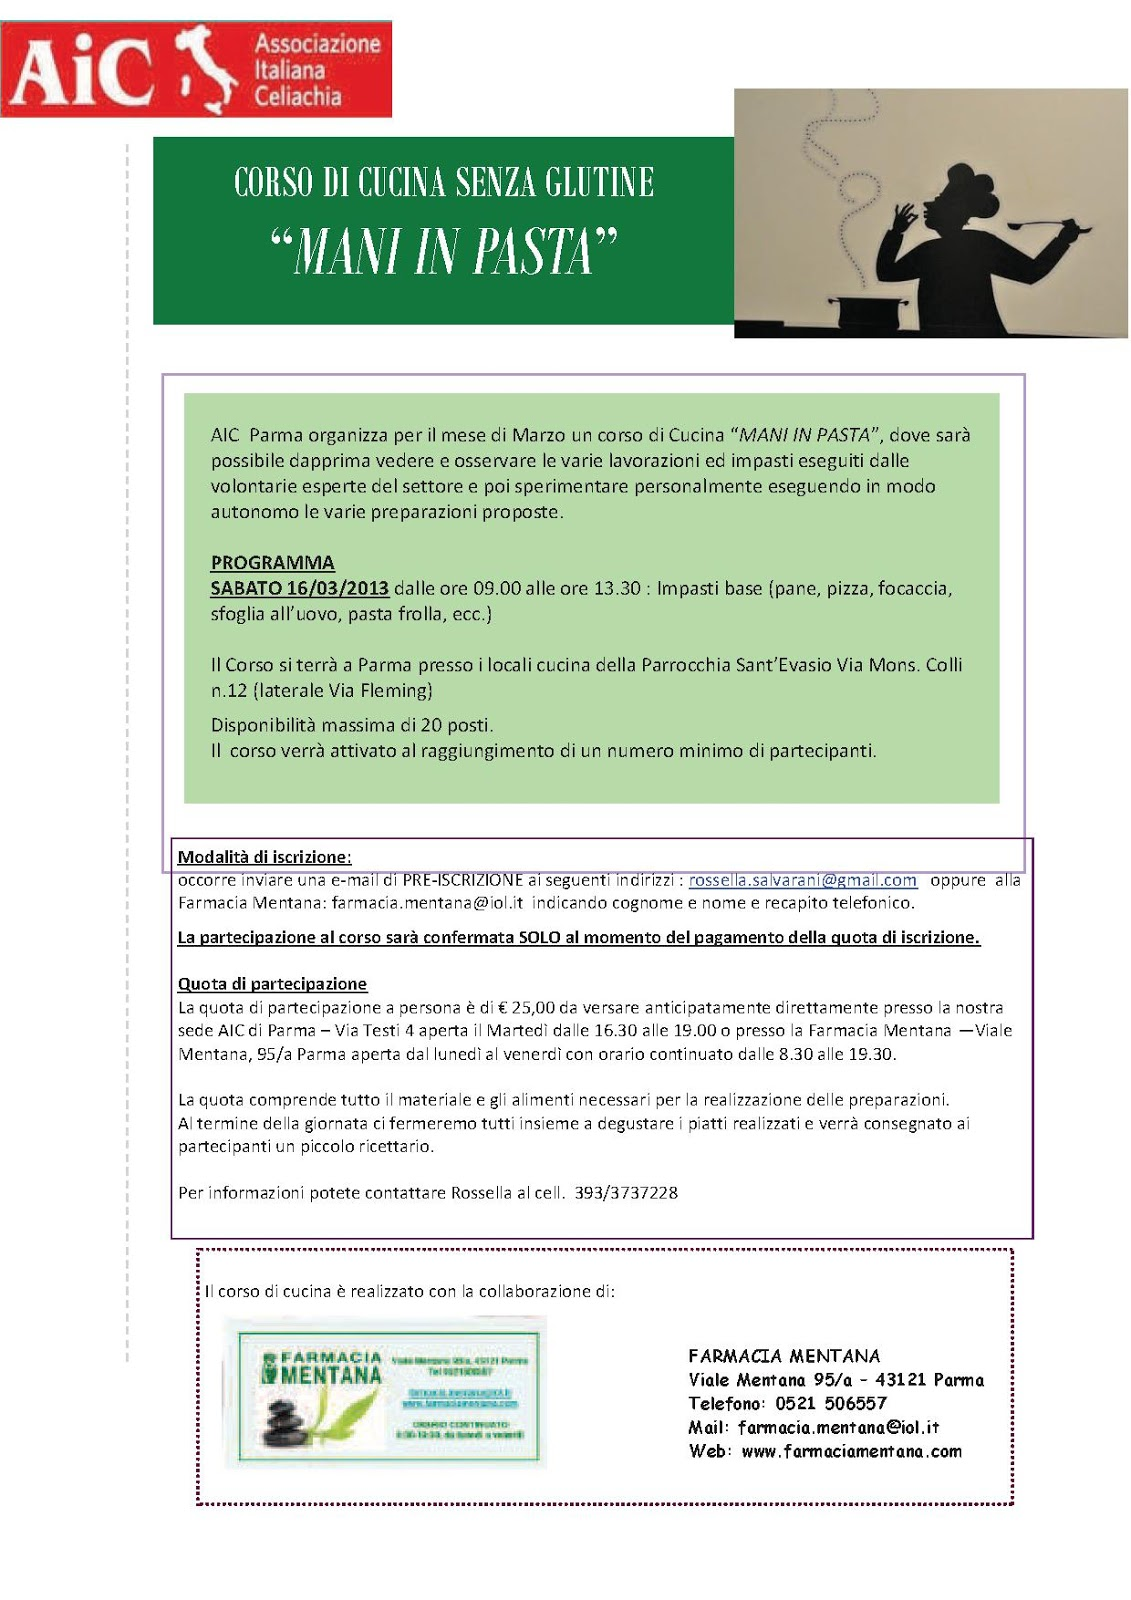 celiachia a parma - Corsi Cucina Parma